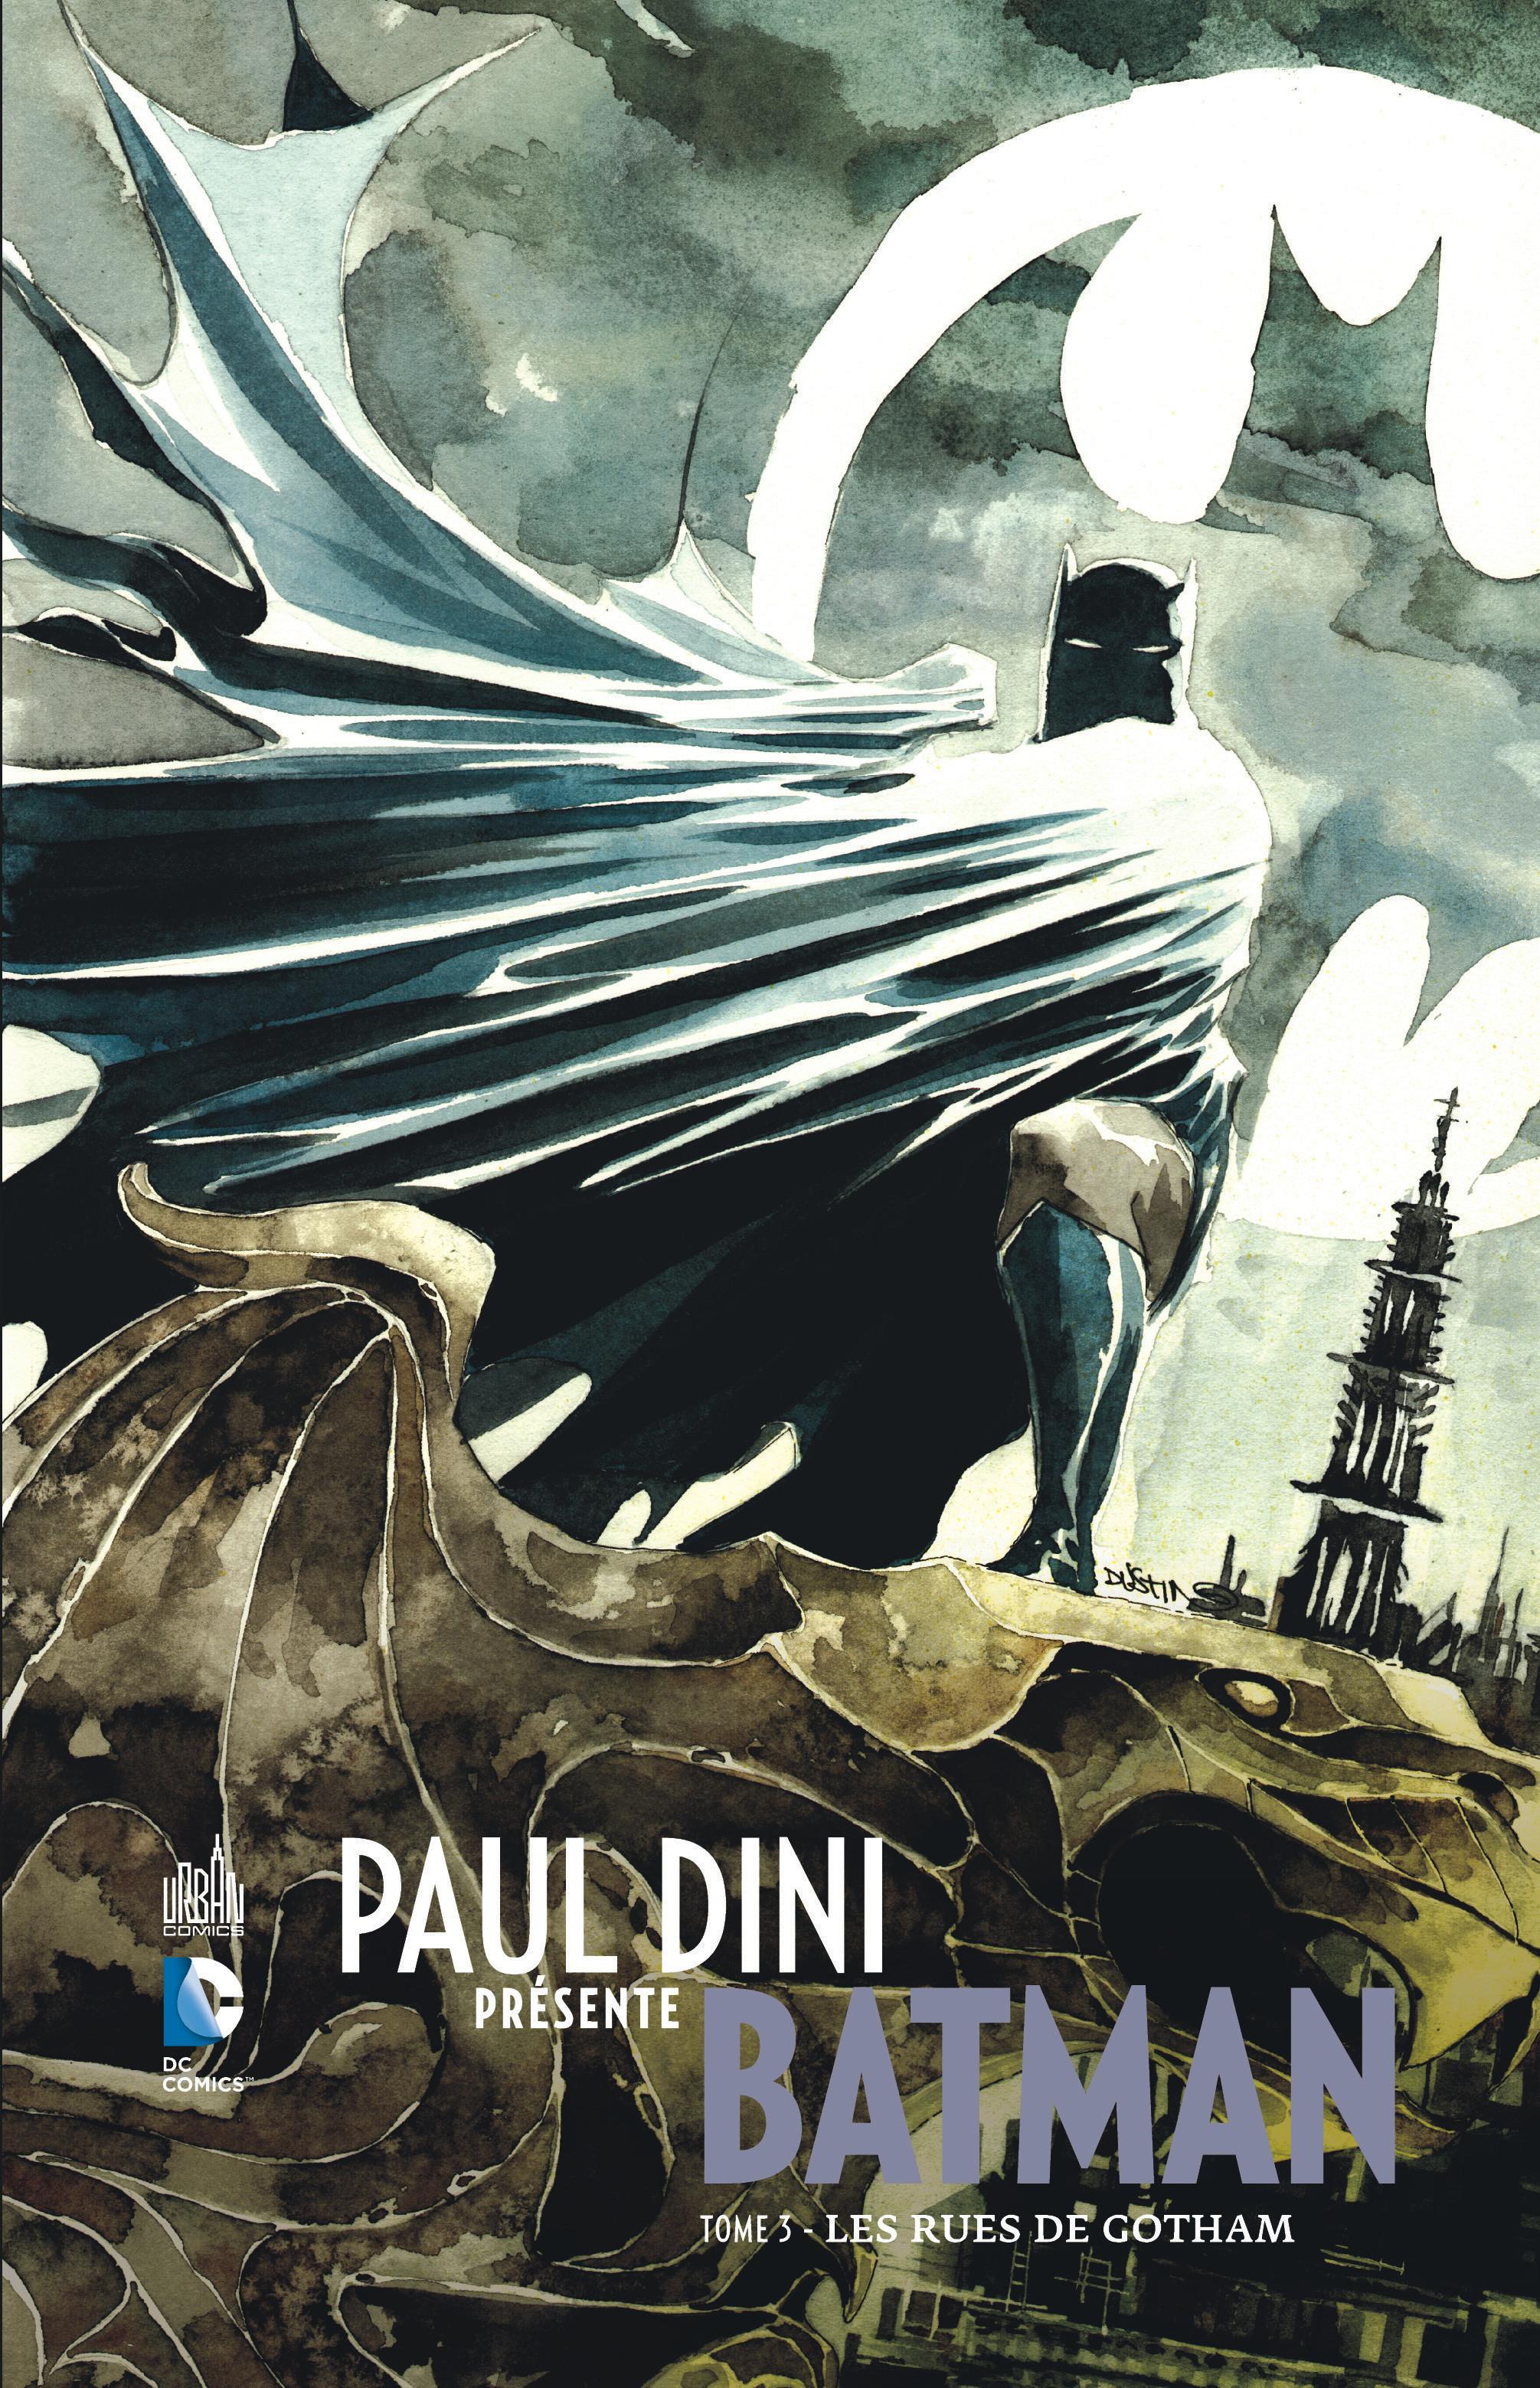 PAUL DINI PRESENTE BATMAN T3